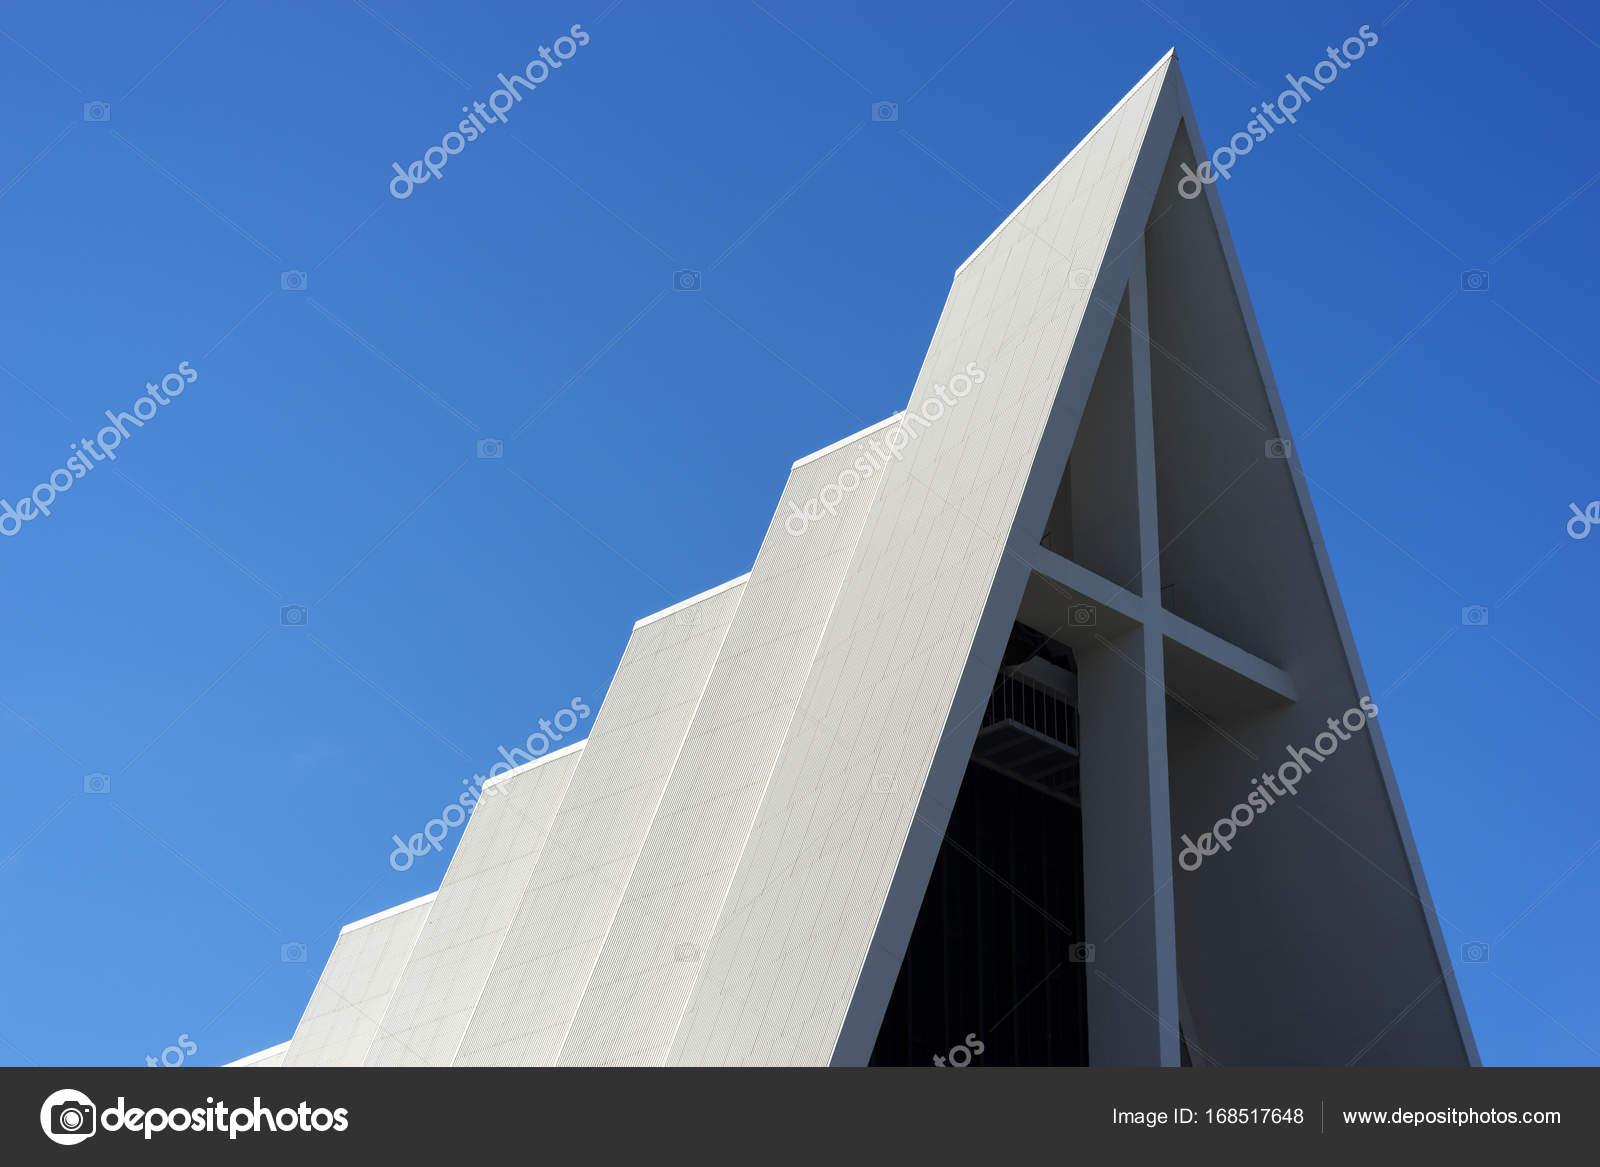 Norway Church Design Background Stock Photo C Spacedrone808 168517648